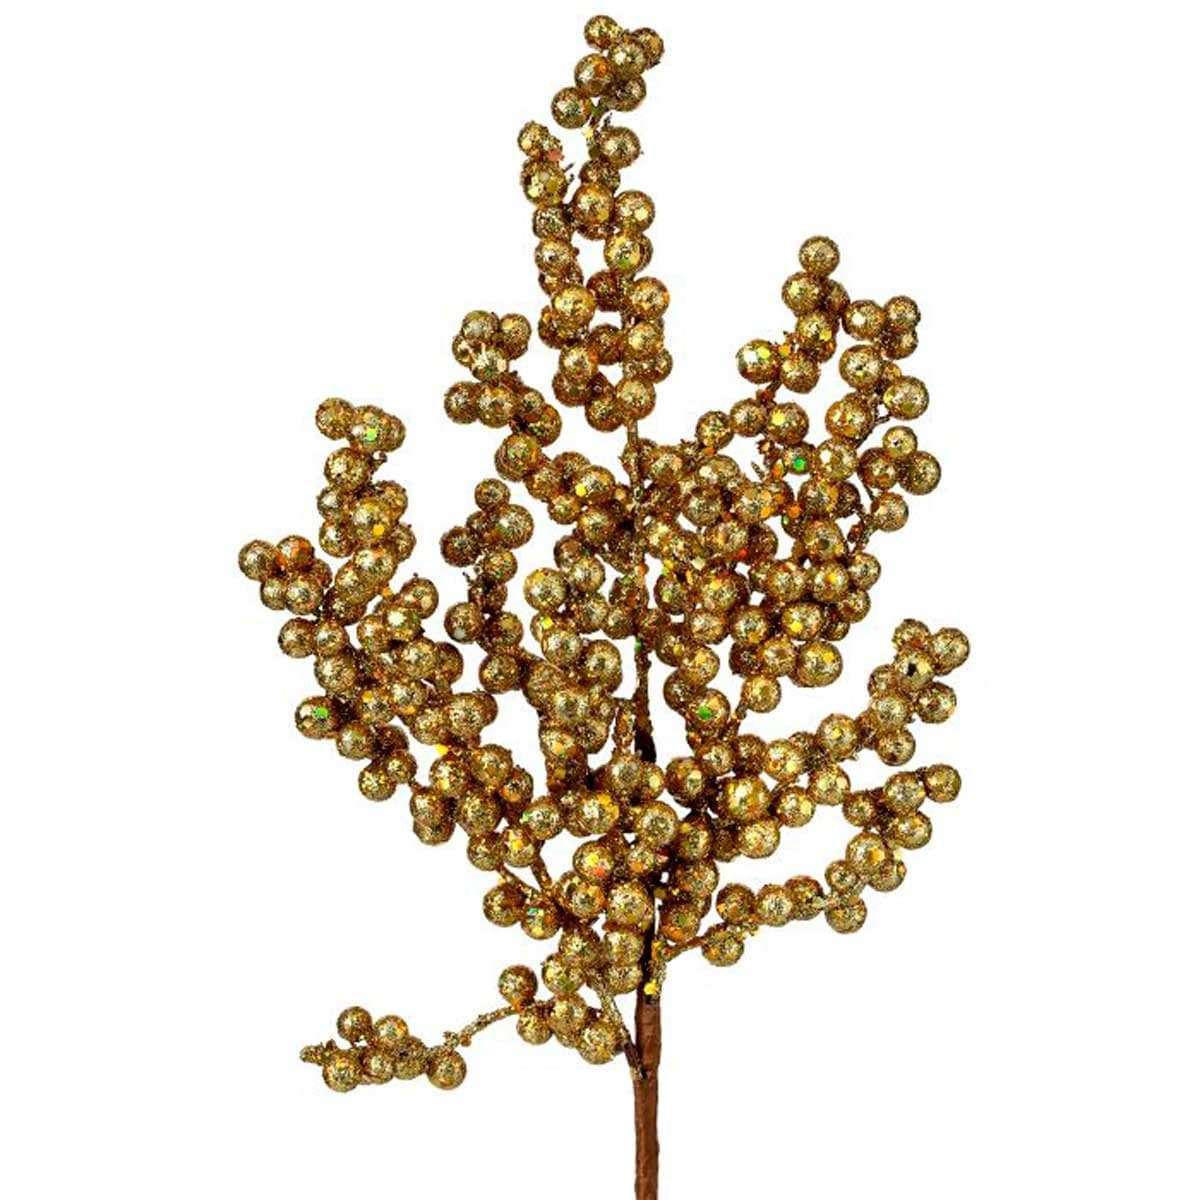 Rama Racimo de Berries Color Oro 40 Cm.